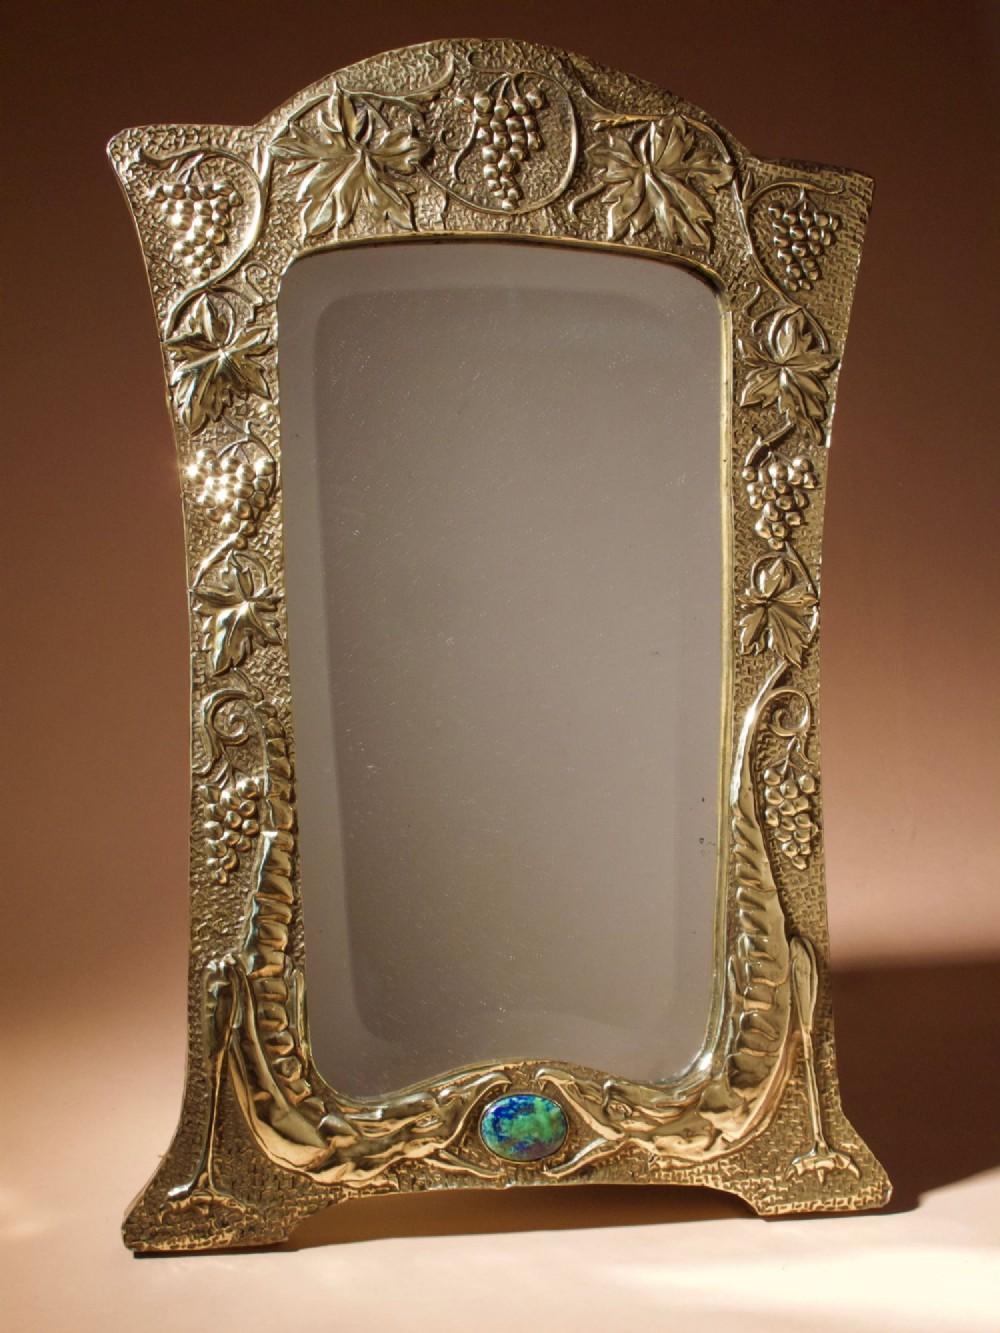 Vintage Embossed Brass Bell / Home Decor / Hanging - #